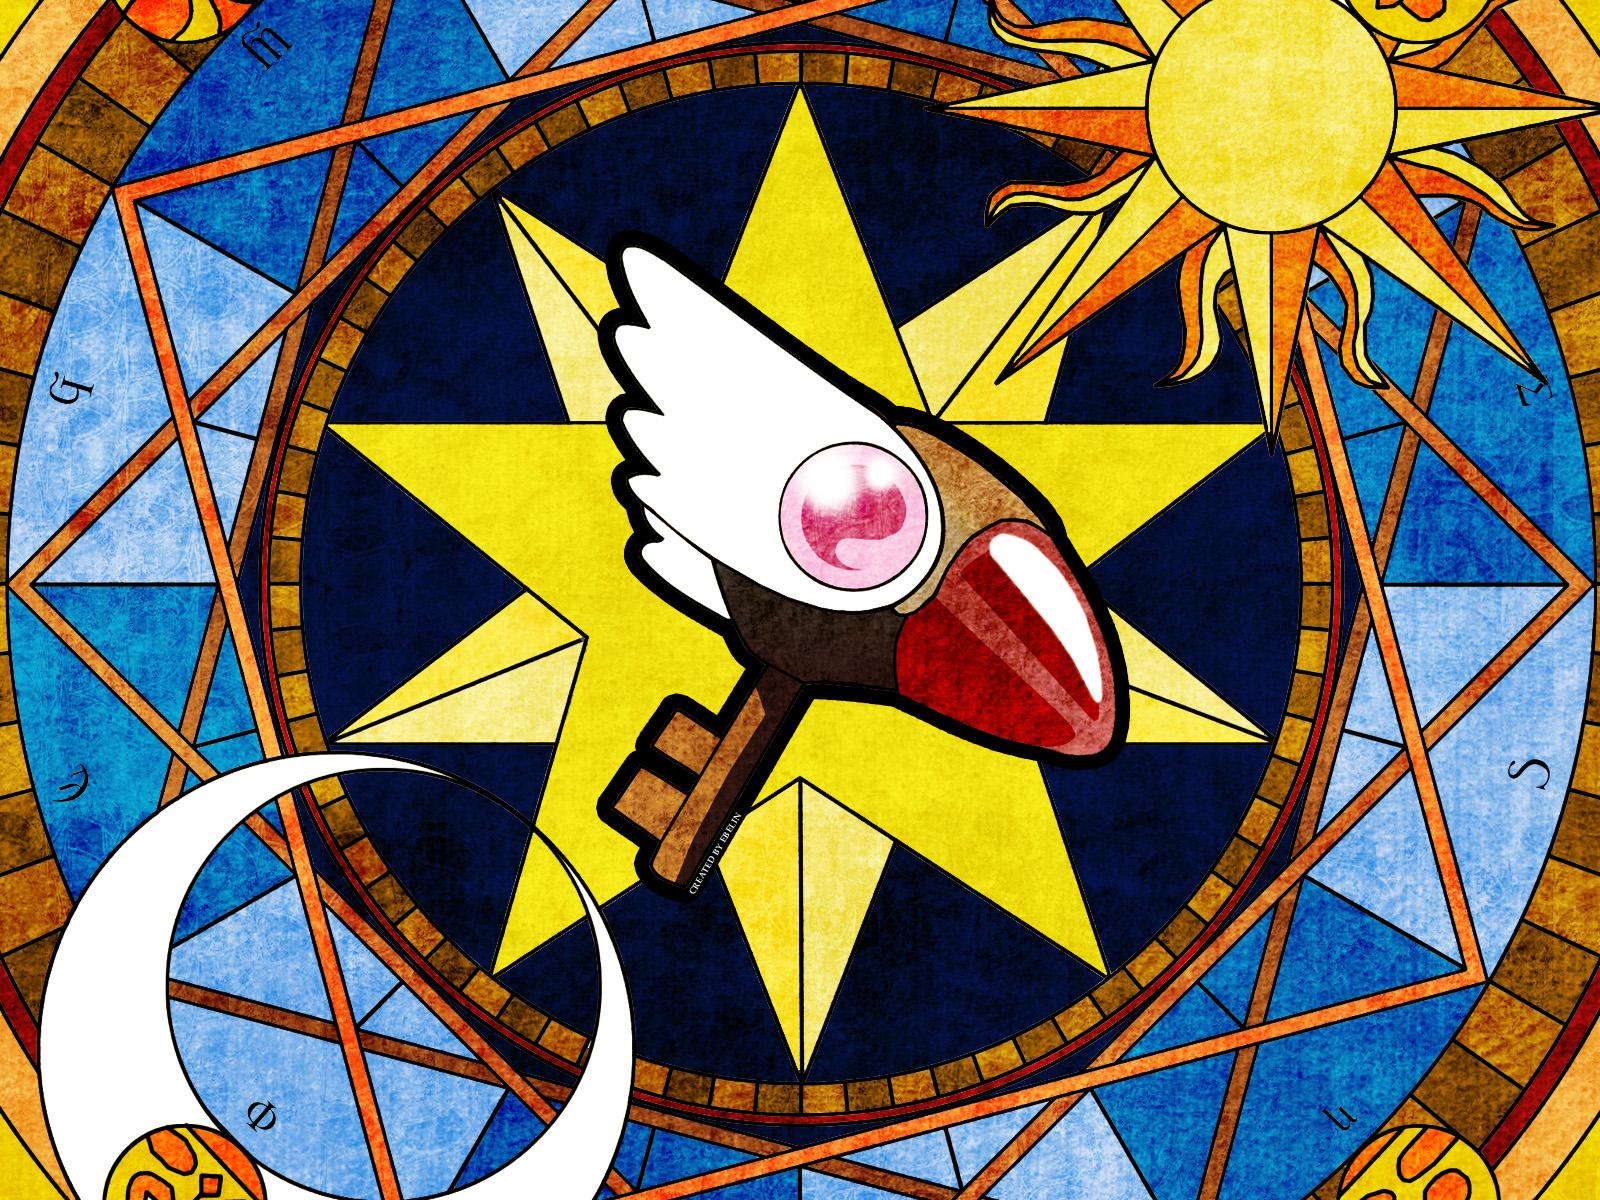 Cardcaptor Sakura Wallpaper: The magic key - Minitokyo